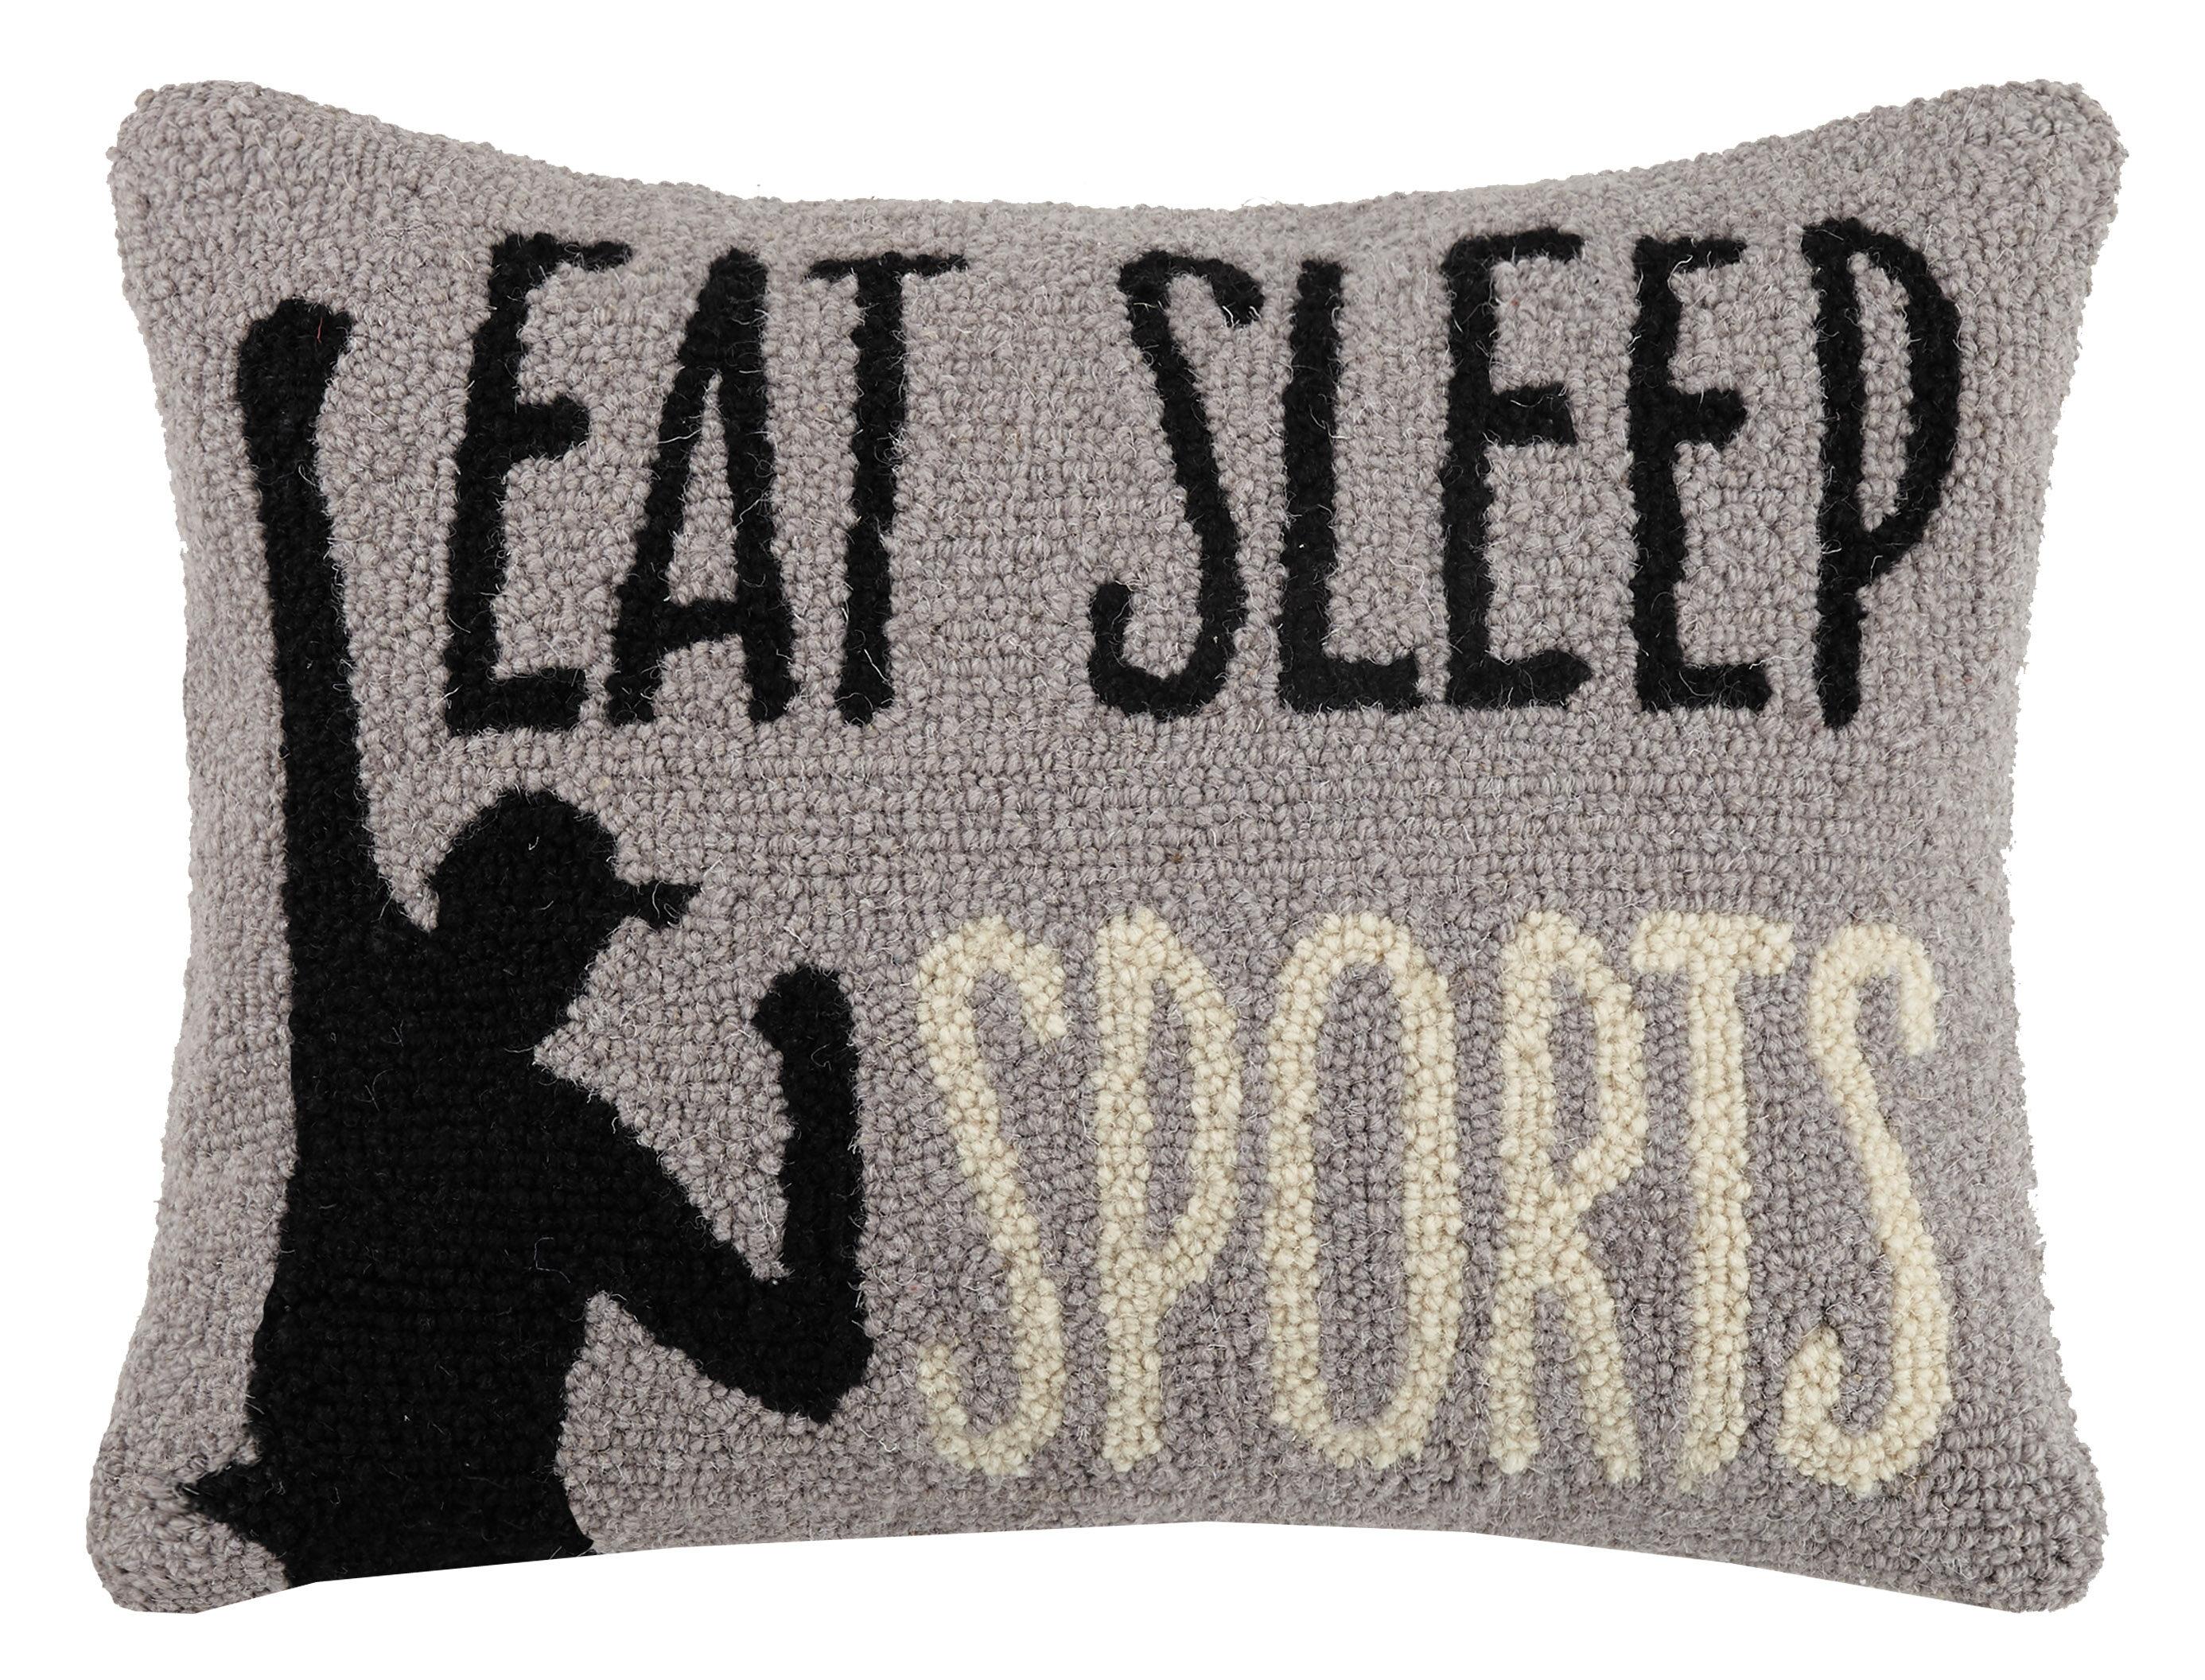 Wool Wrought Studio Throw Pillows You Ll Love In 2021 Wayfair